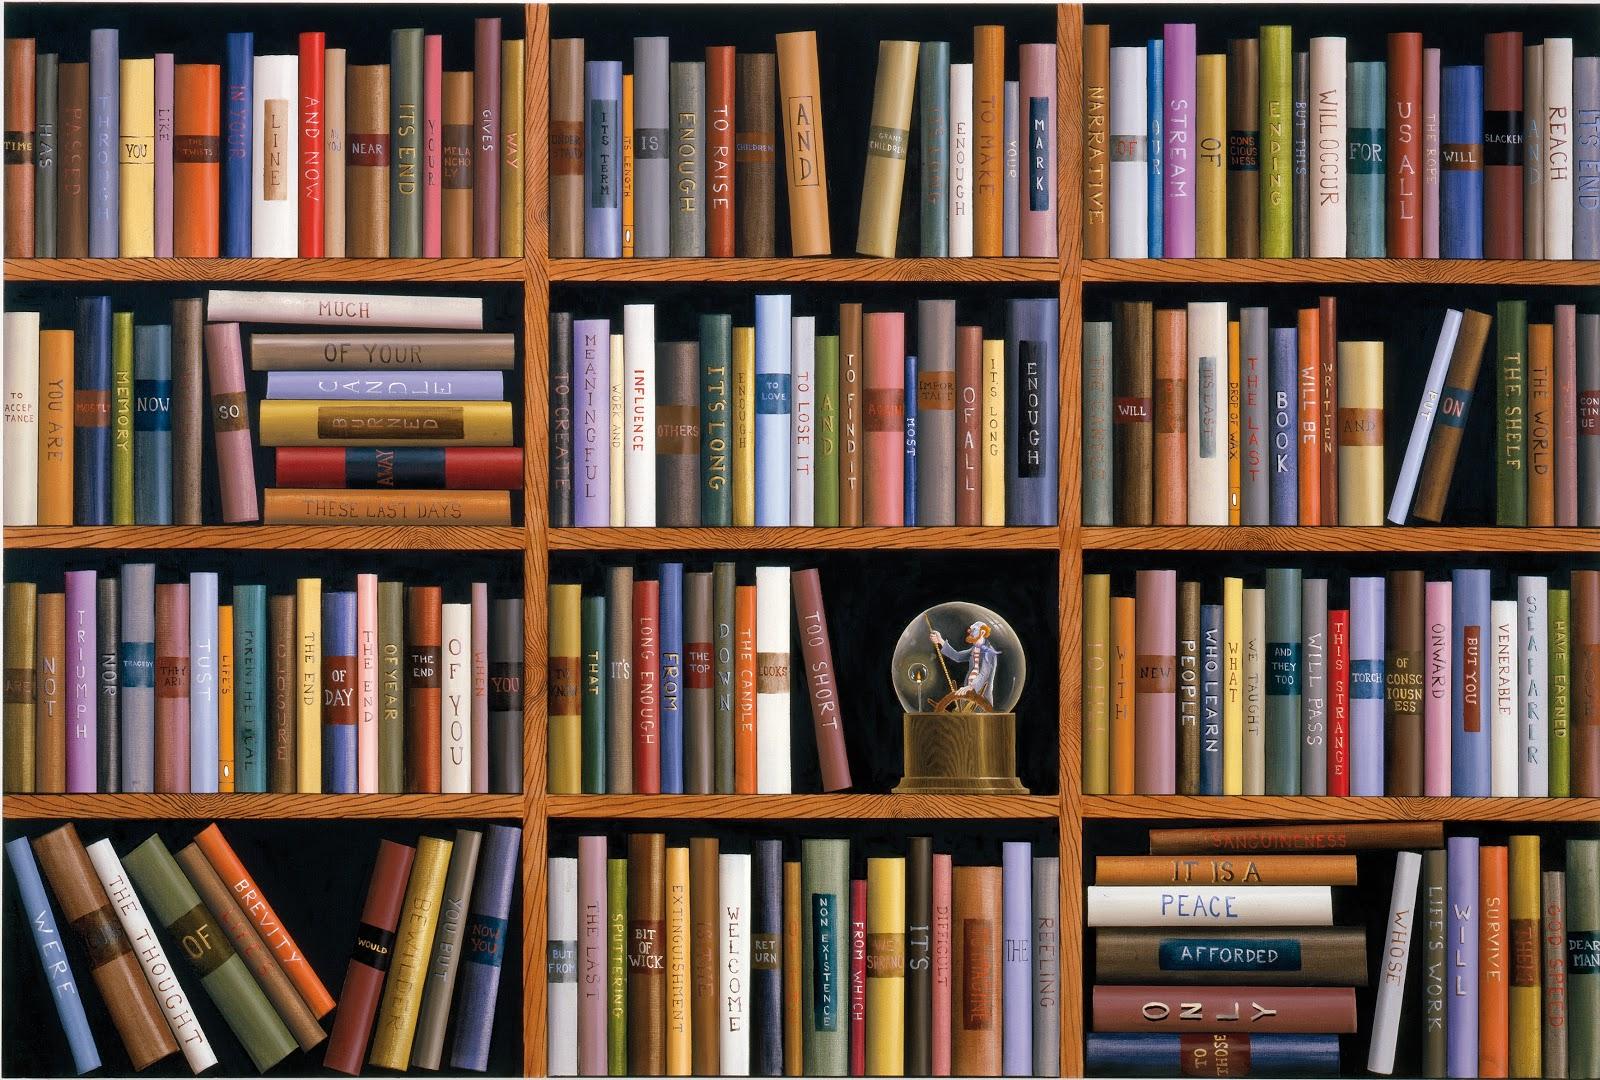 books shelves spencer painted oil filled paintings landers sean trompe oeil shelf alley janssen tchotchkes galerie brussels rodolphe 1962 linen